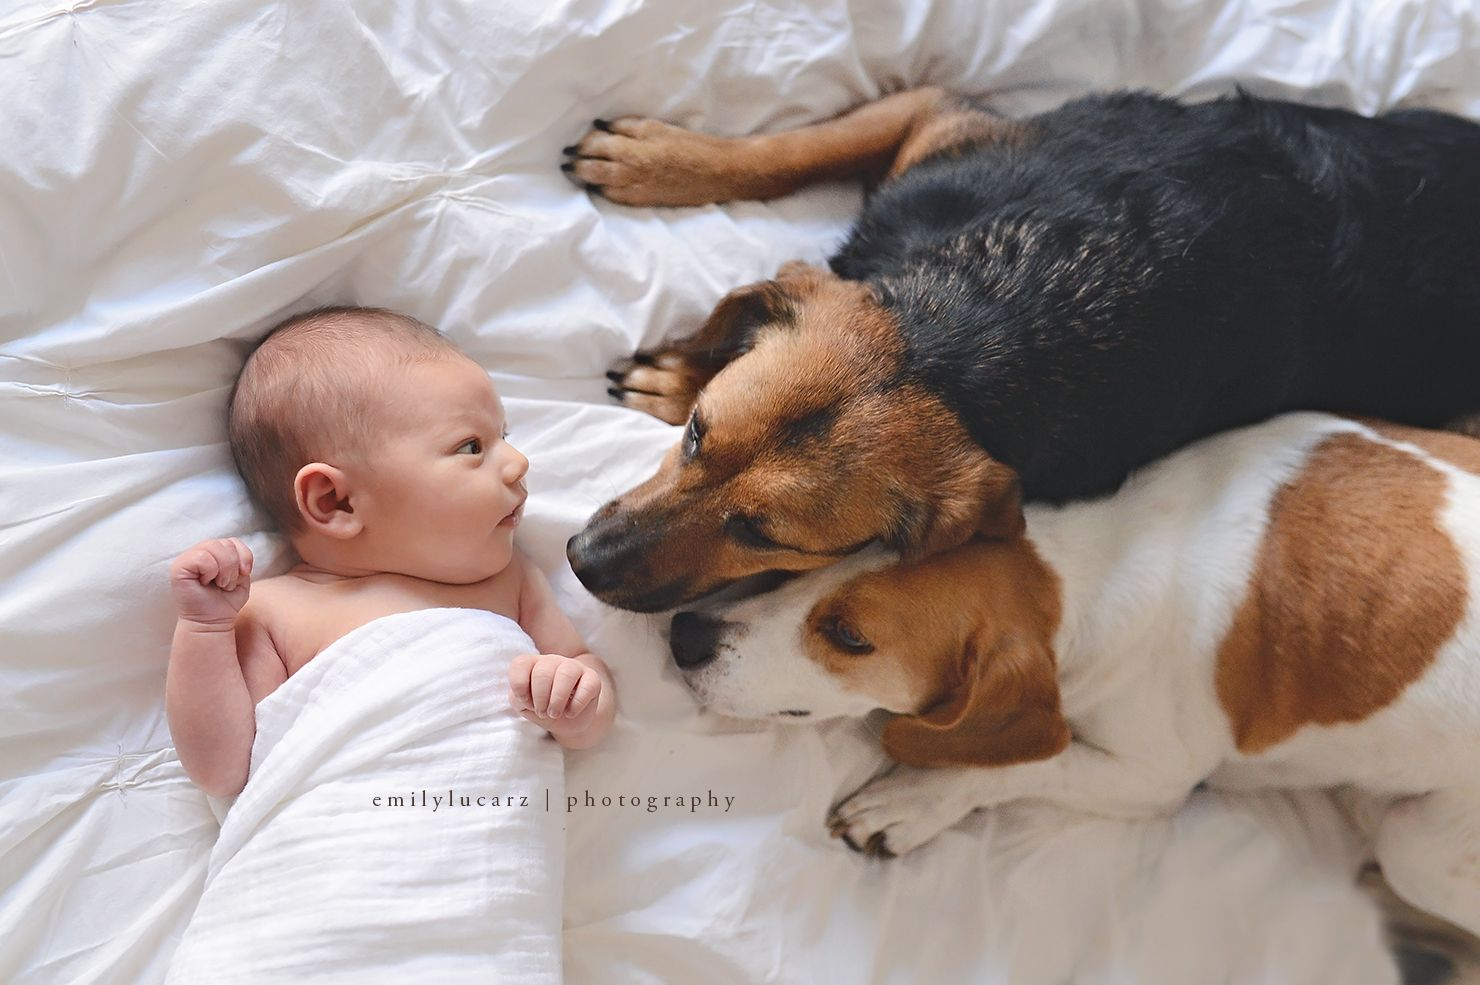 Newborn Photography With Dog